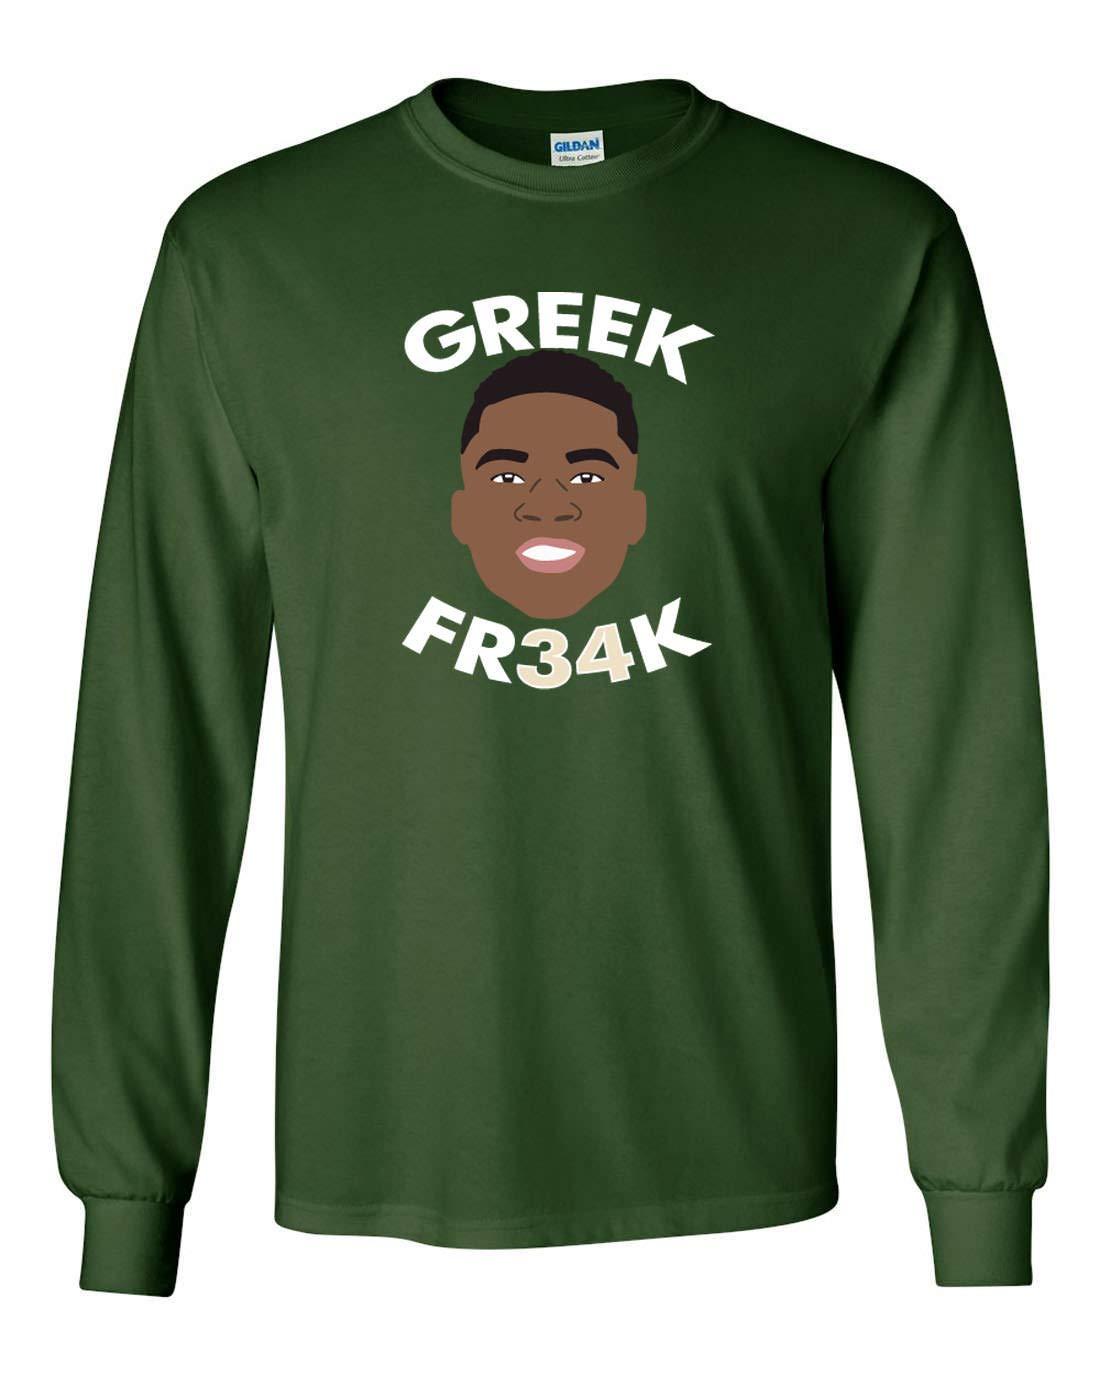 Green Milwaukee Giannis Greek Face Tshirt